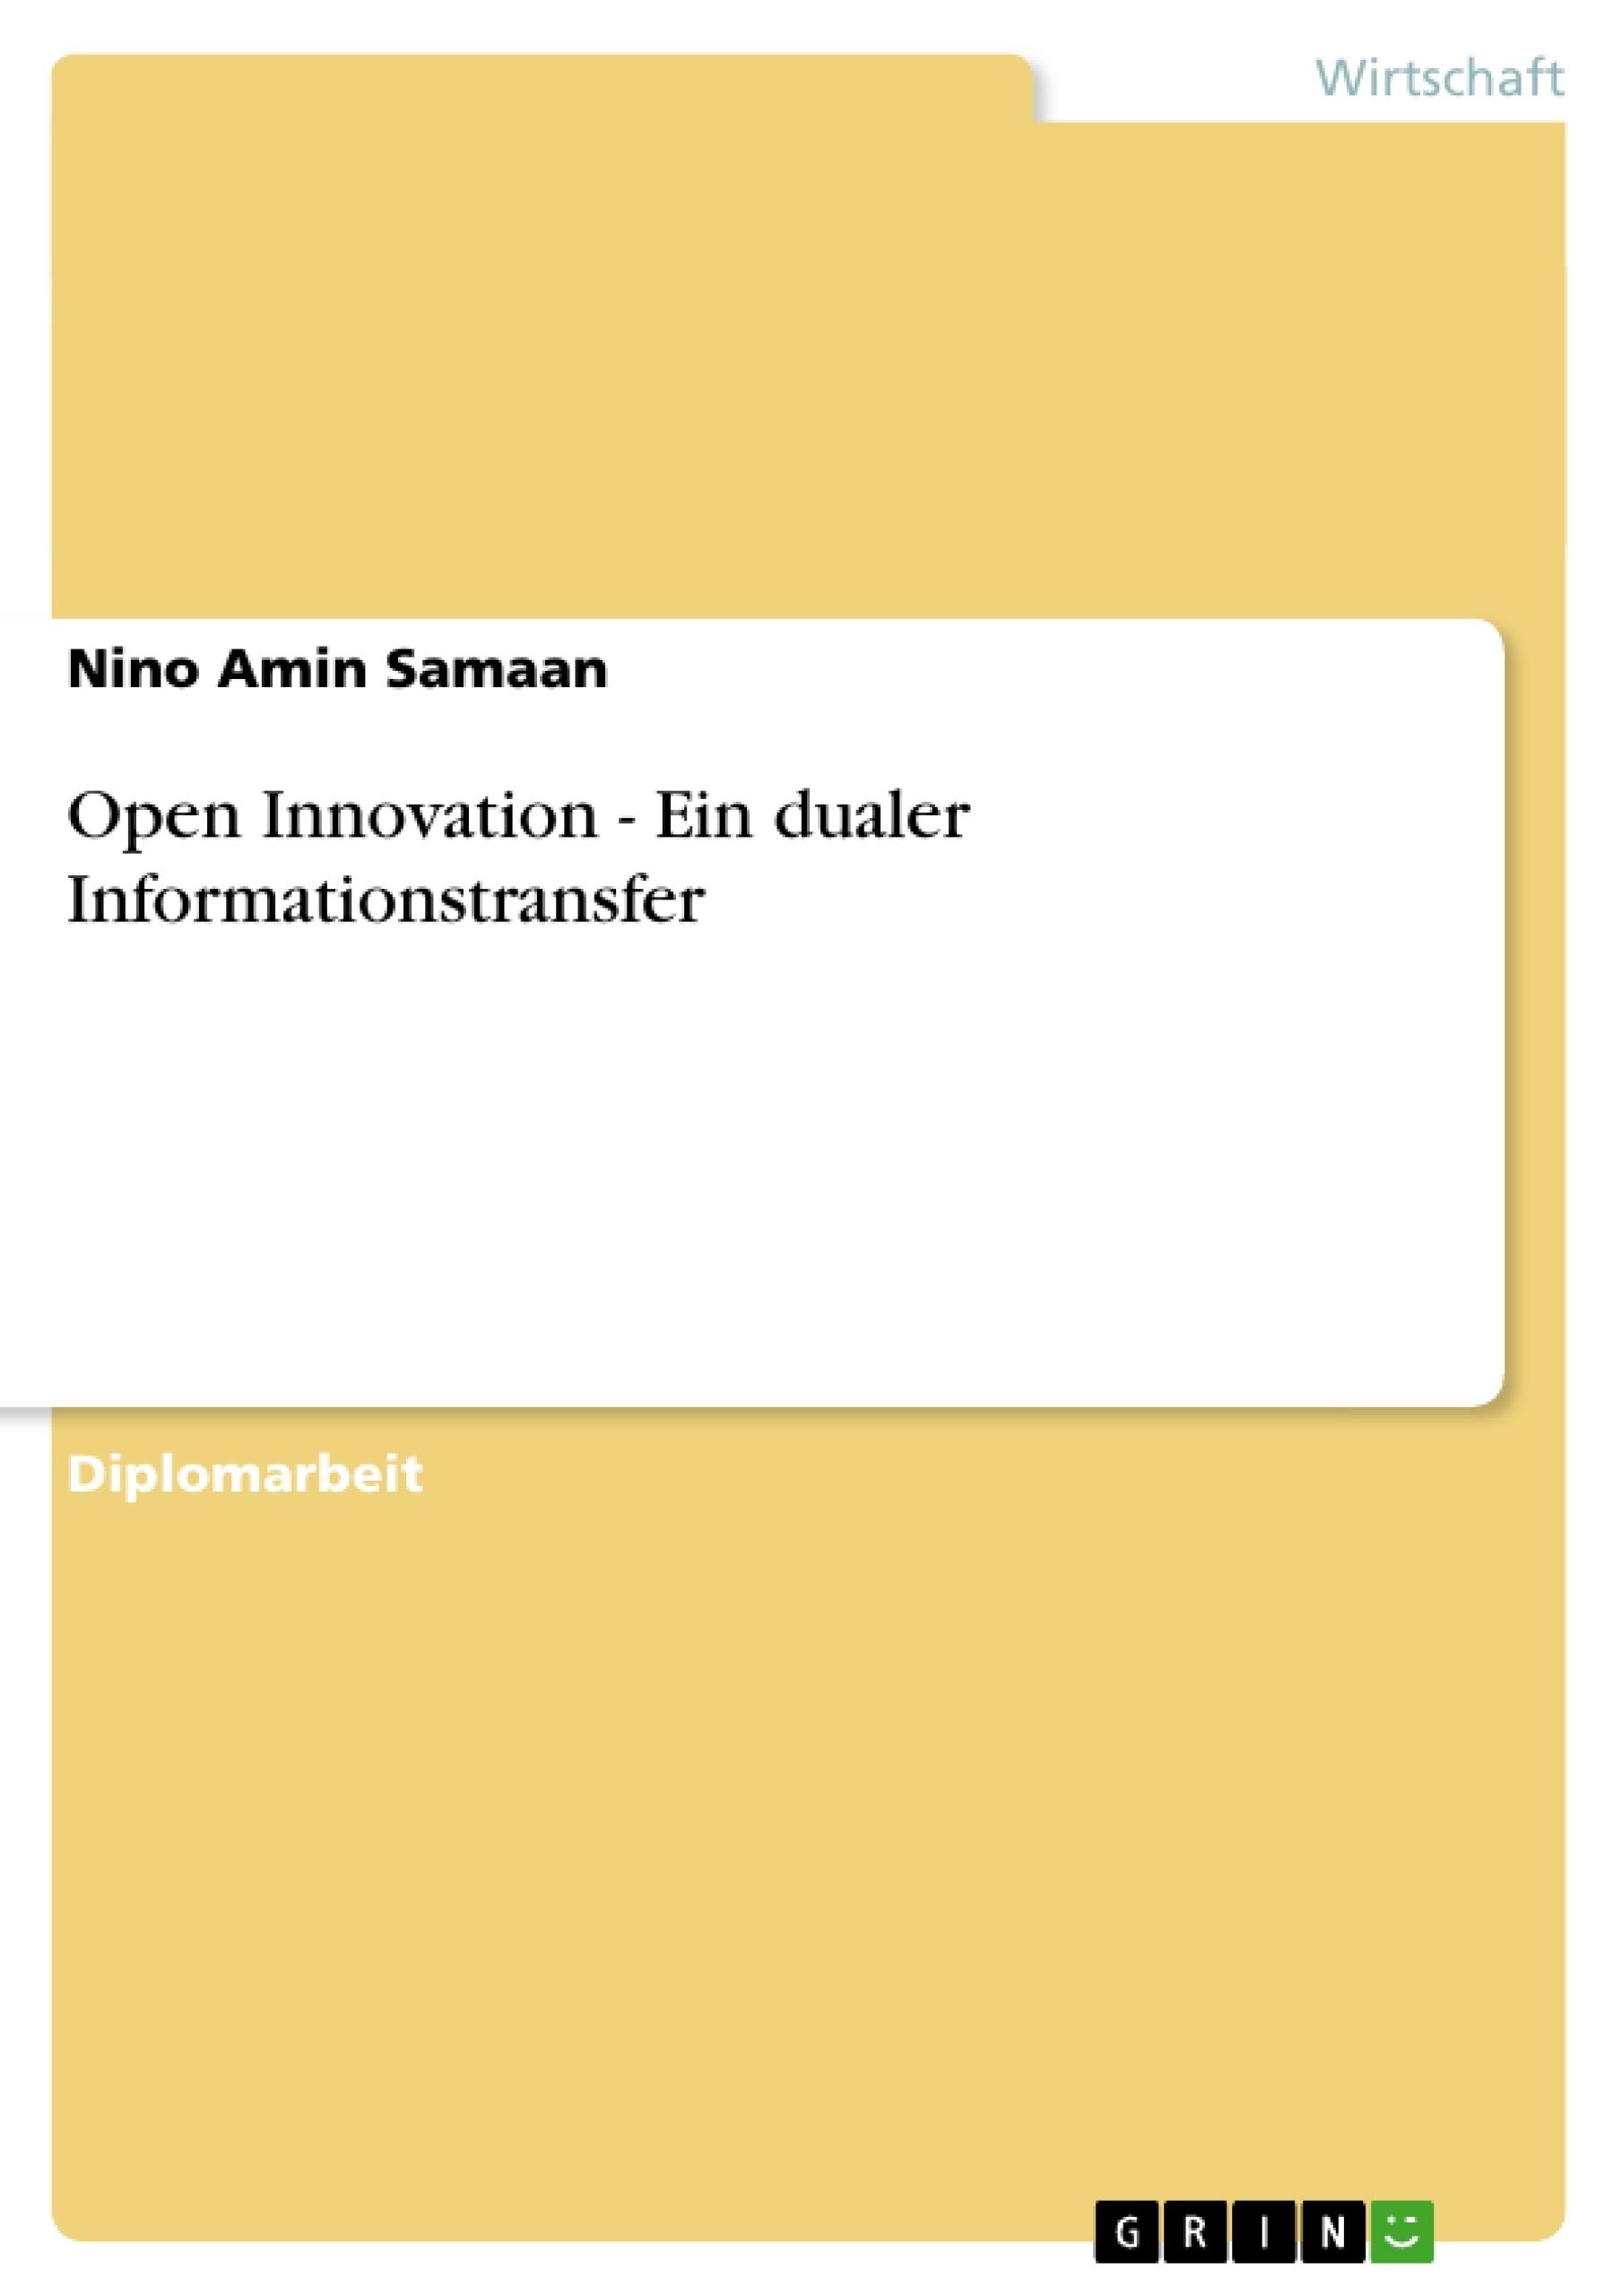 Titel: Open Innovation - Ein dualer Informationstransfer